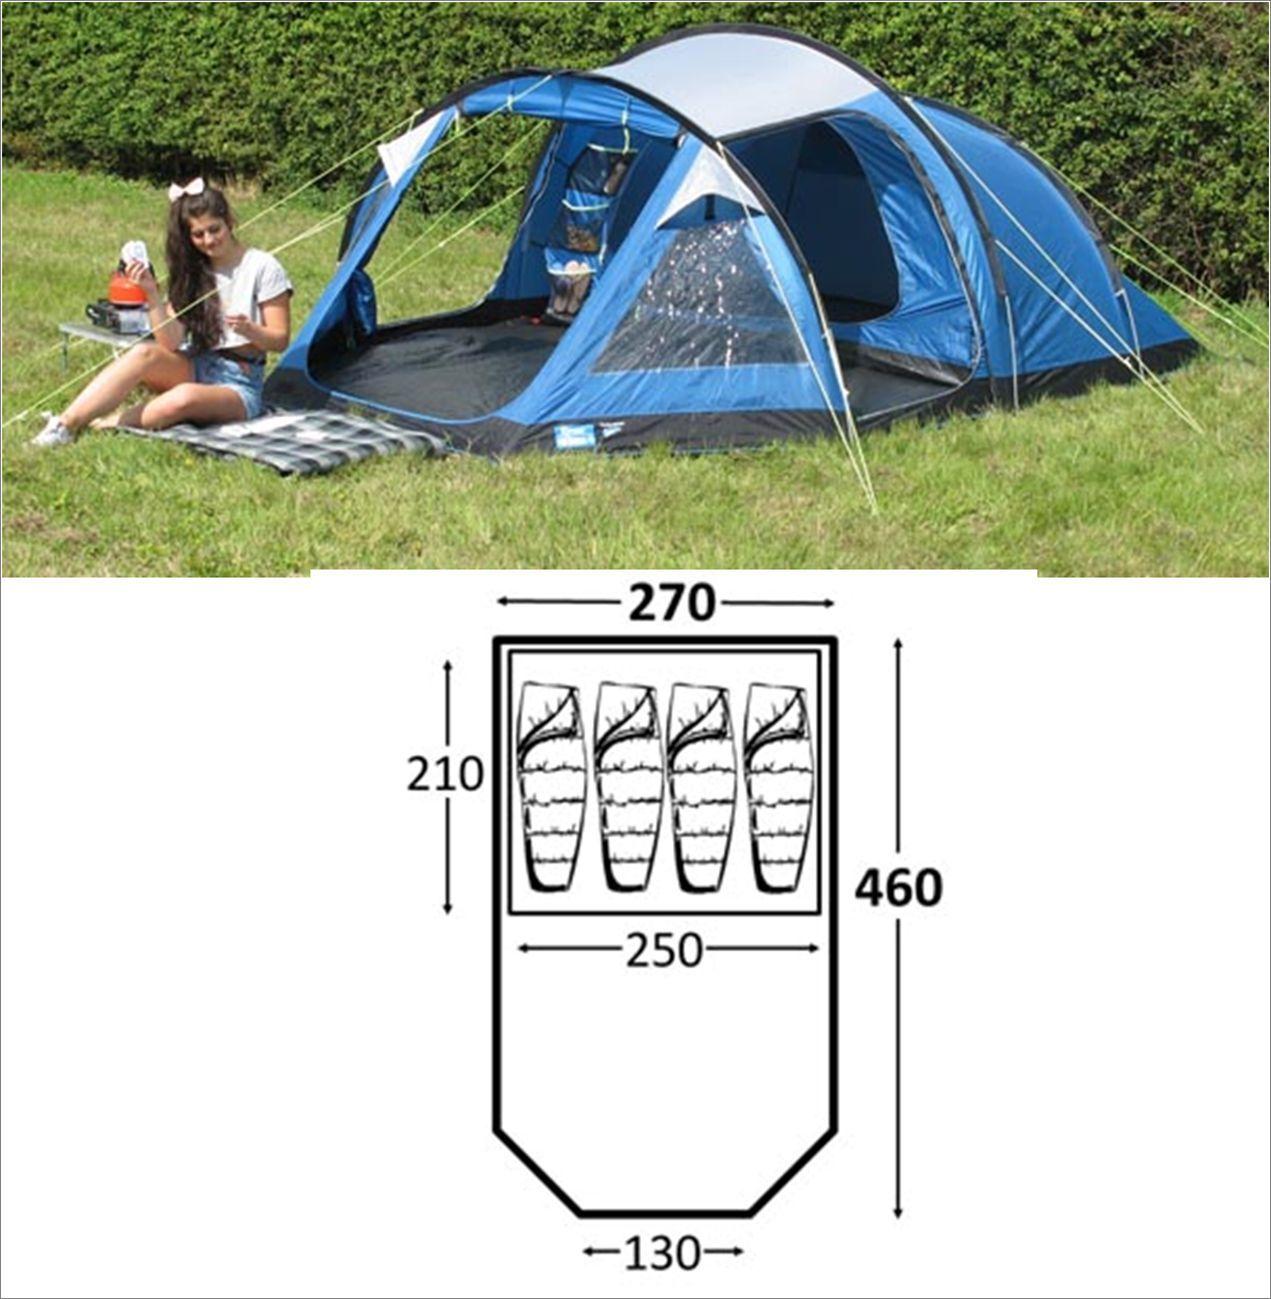 Kampa Mersea 4 berth person man festival camping tent